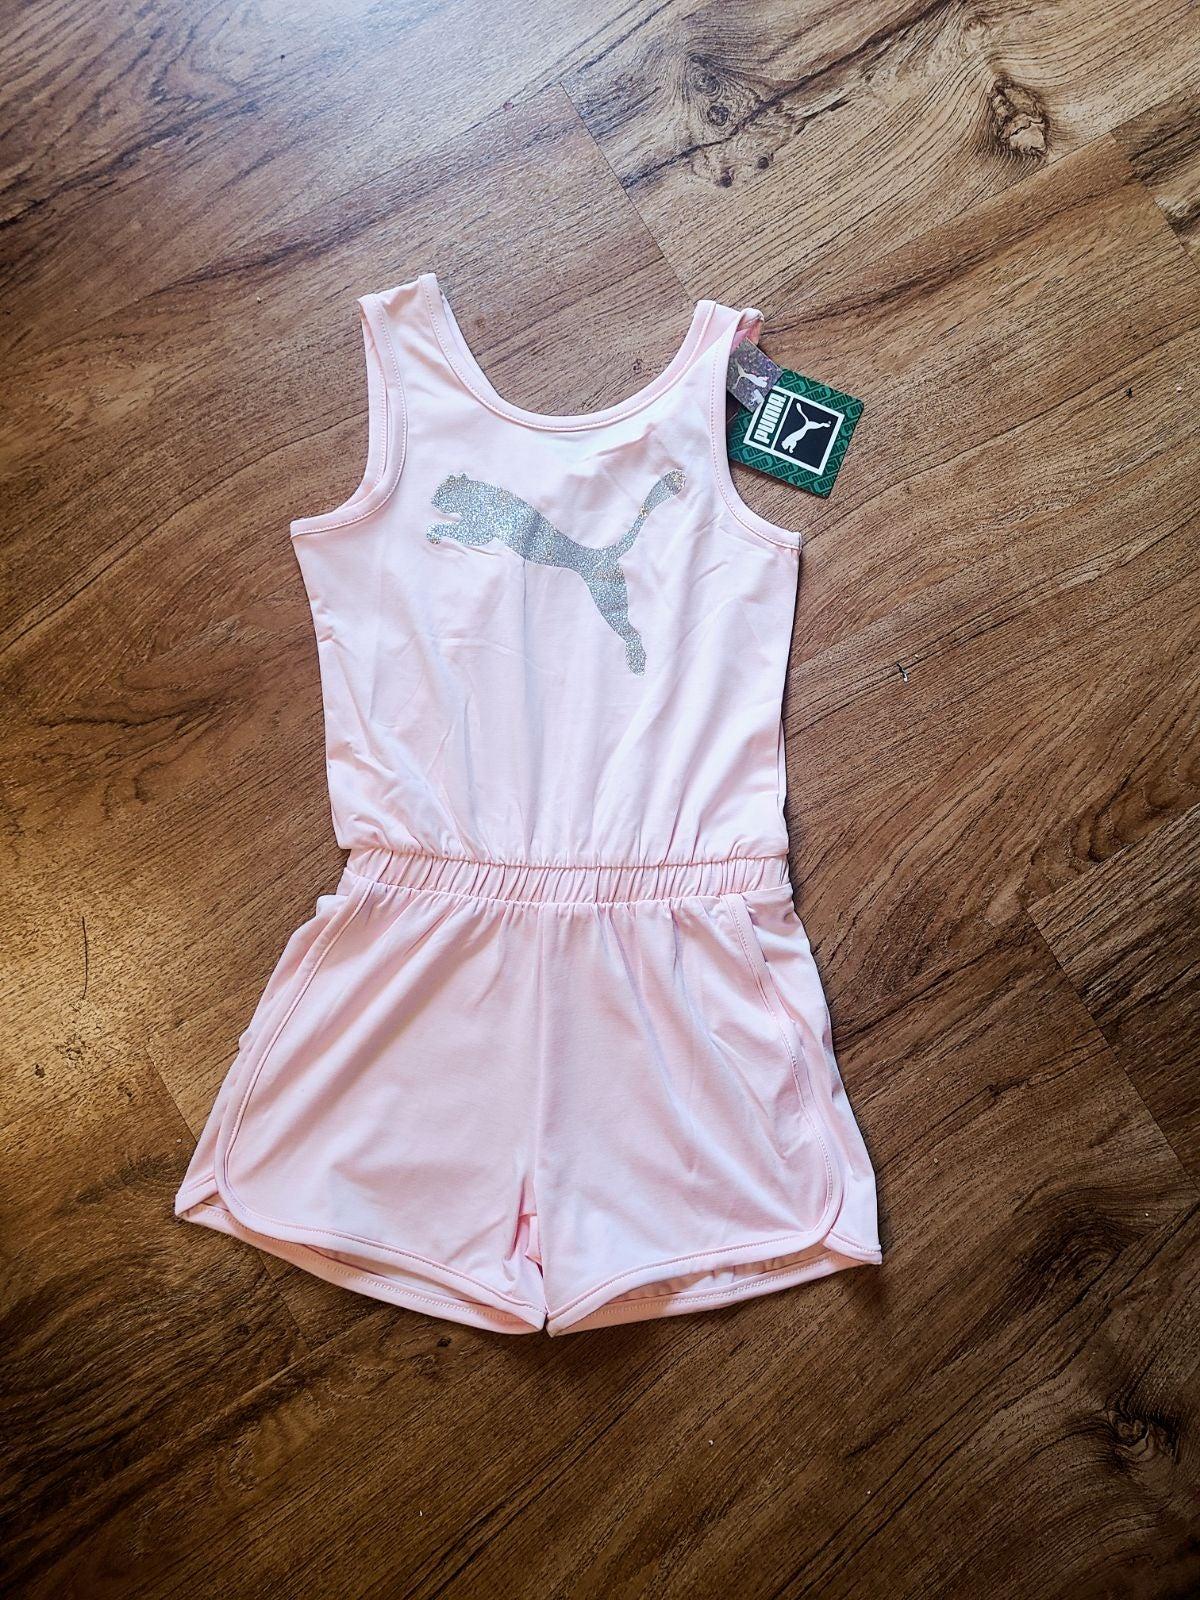 Puma Shorts Romper NWT pink